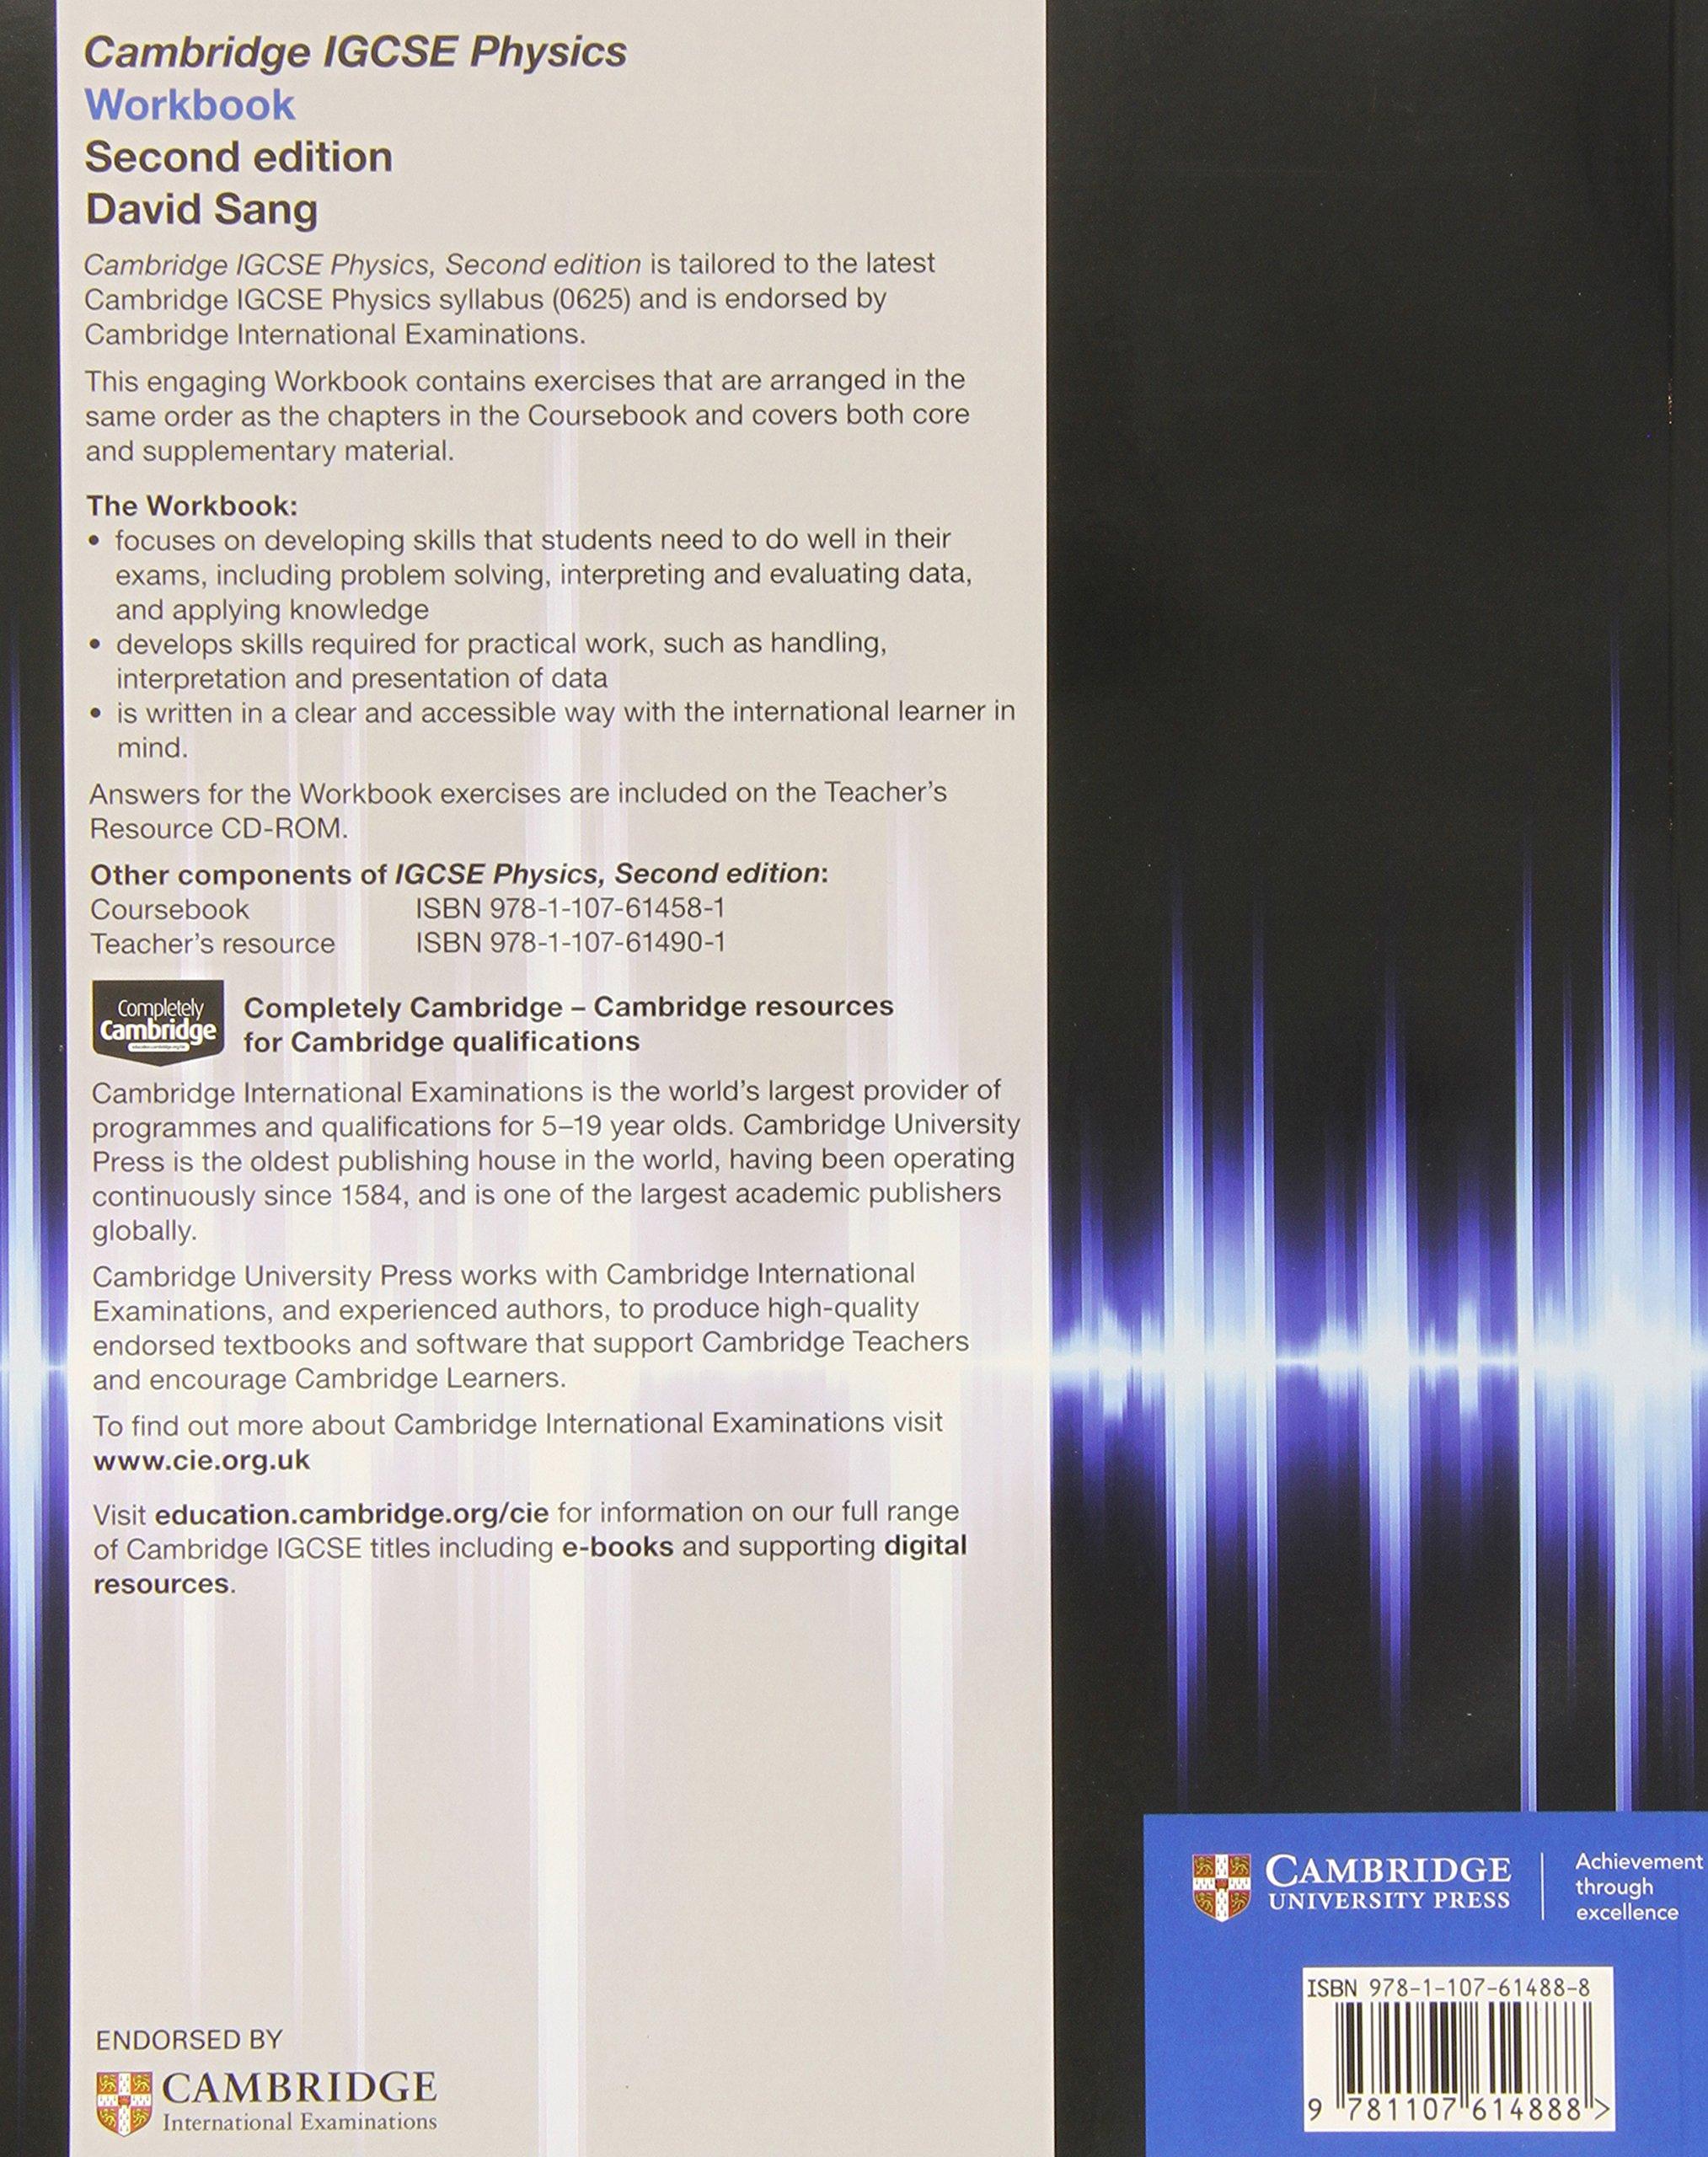 Cambridge IGCSE® Physics Workbook (Cambridge International IGCSE